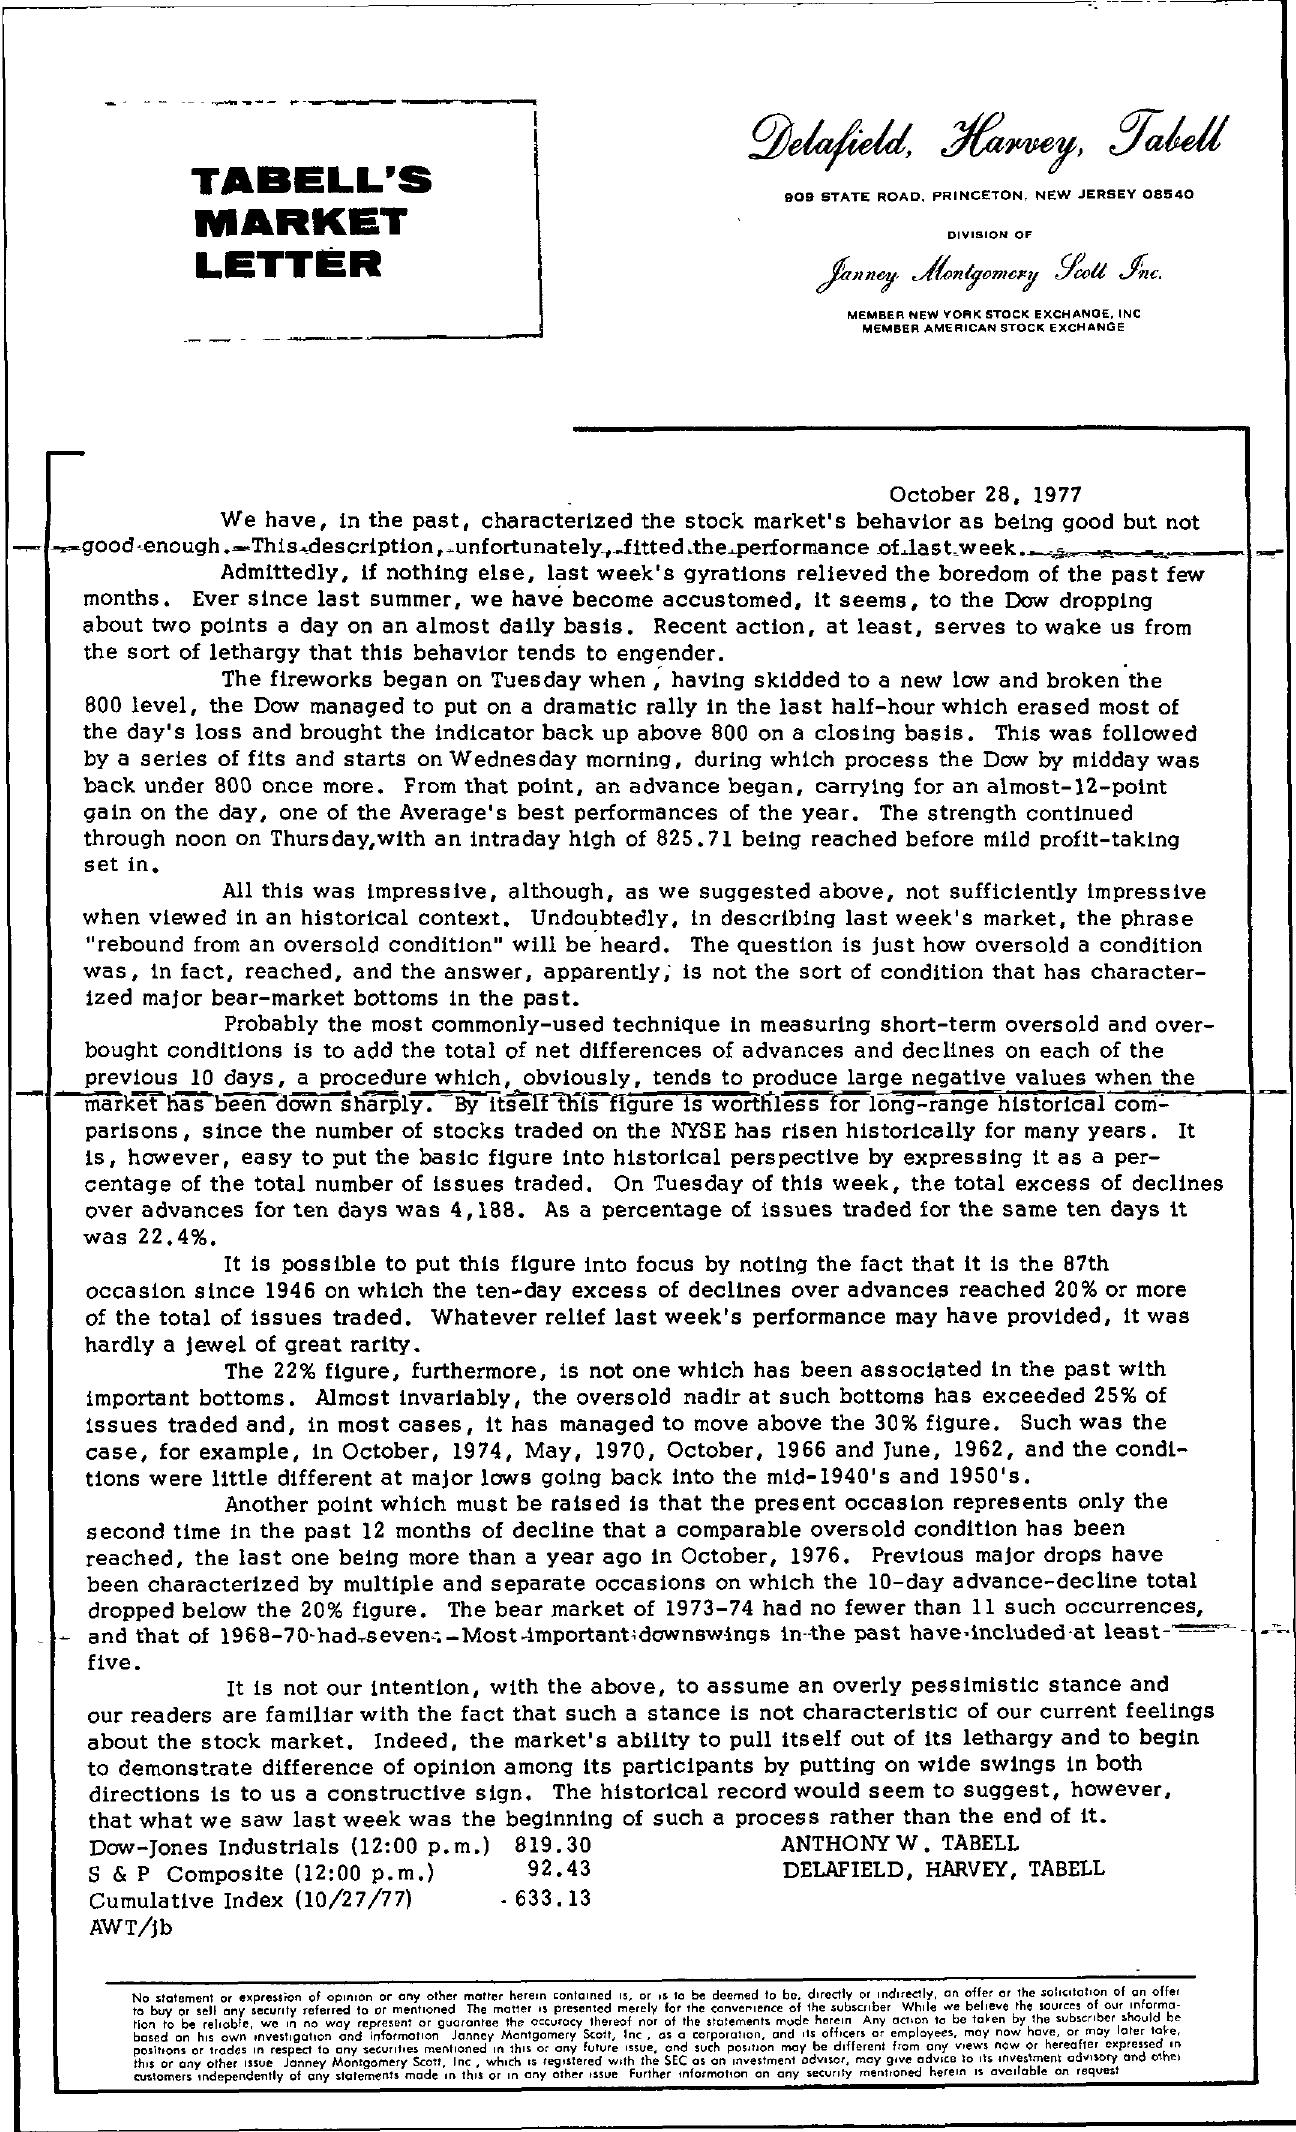 Tabell's Market Letter - October 28, 1977